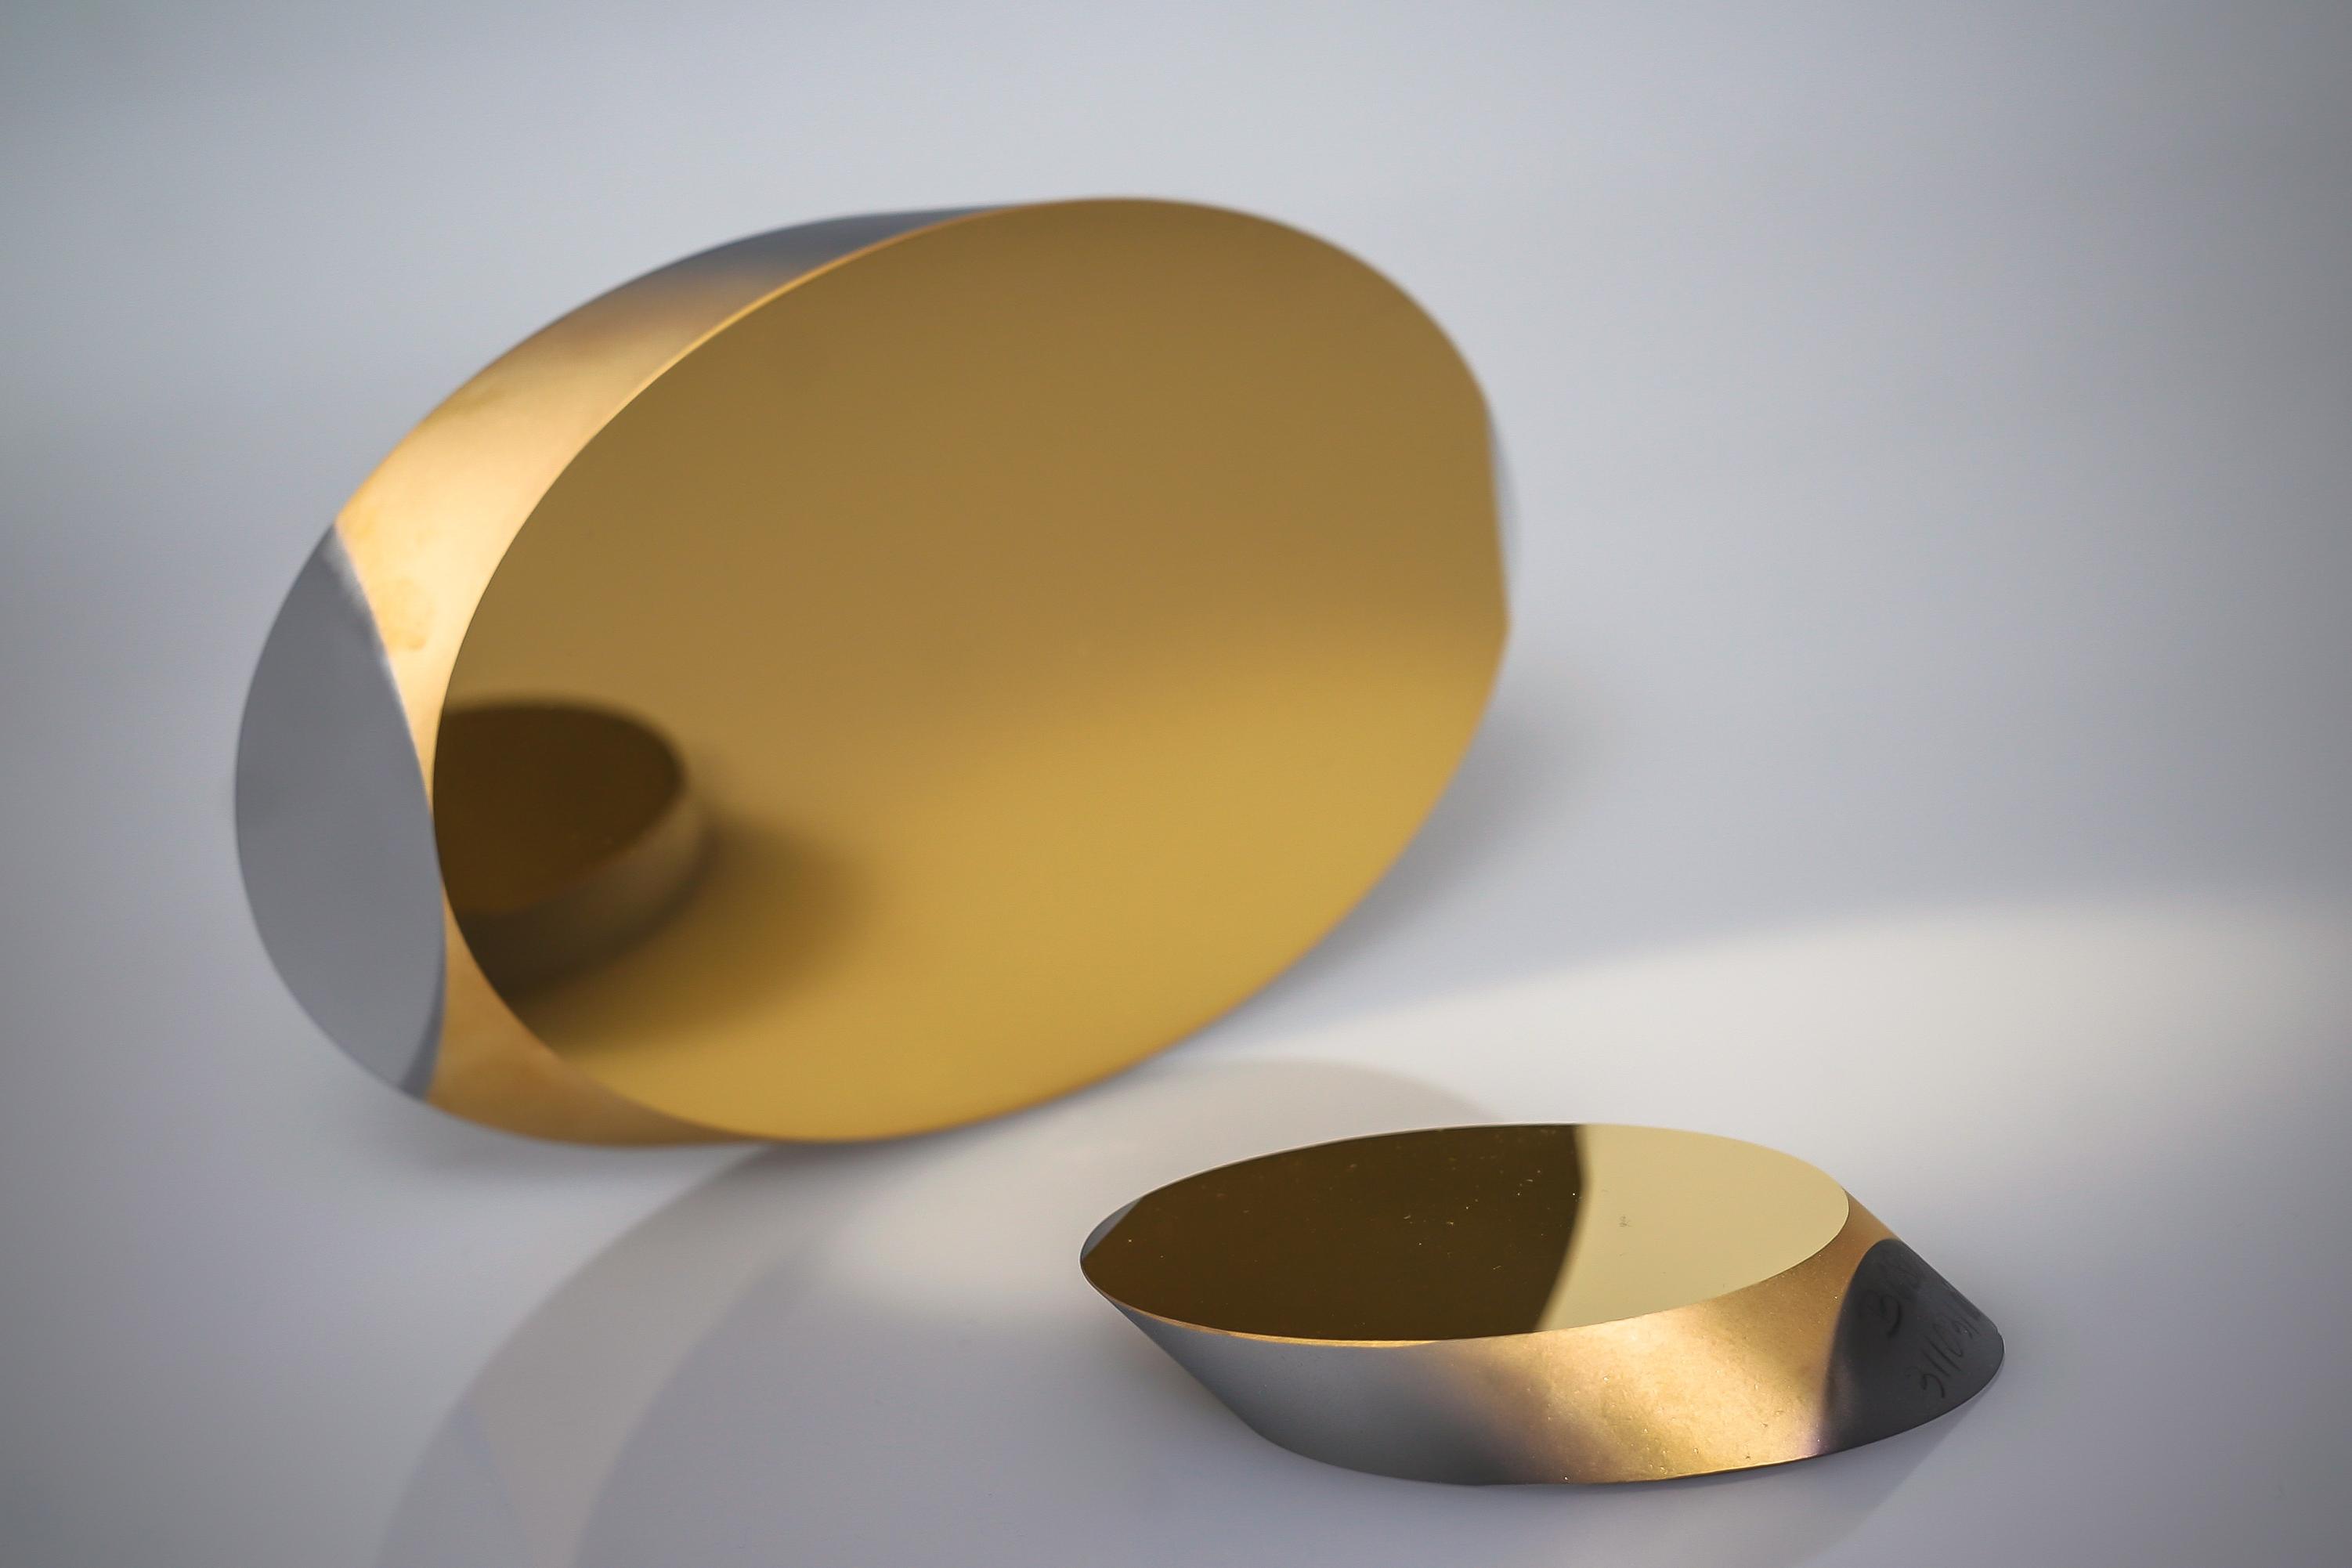 Metalic HR coating